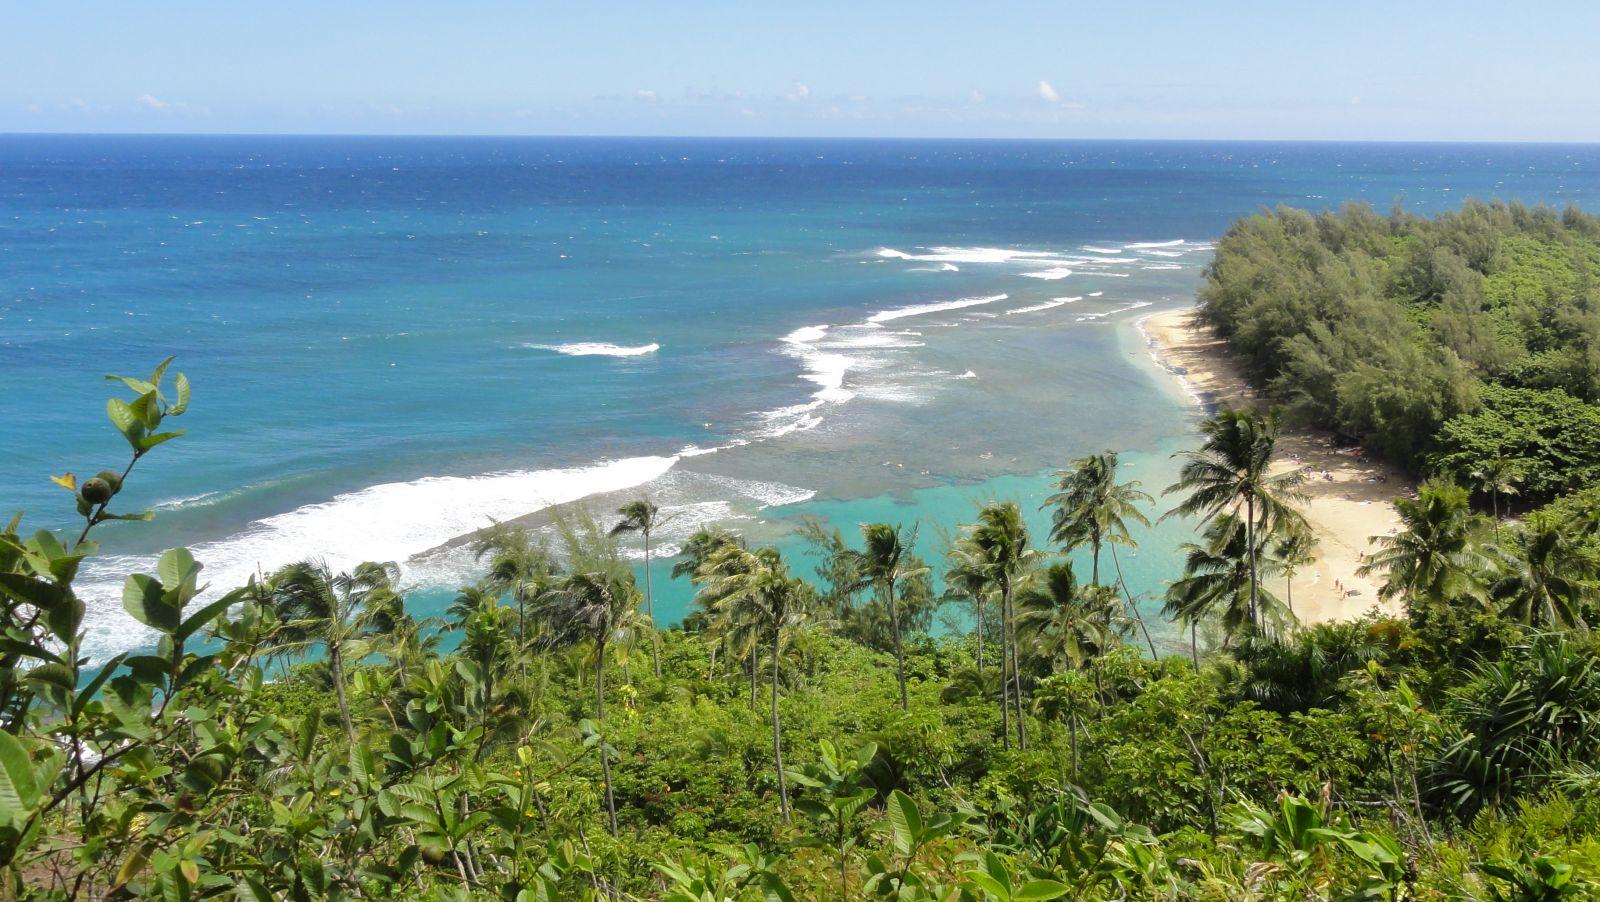 Kauai Vs Big Island In April